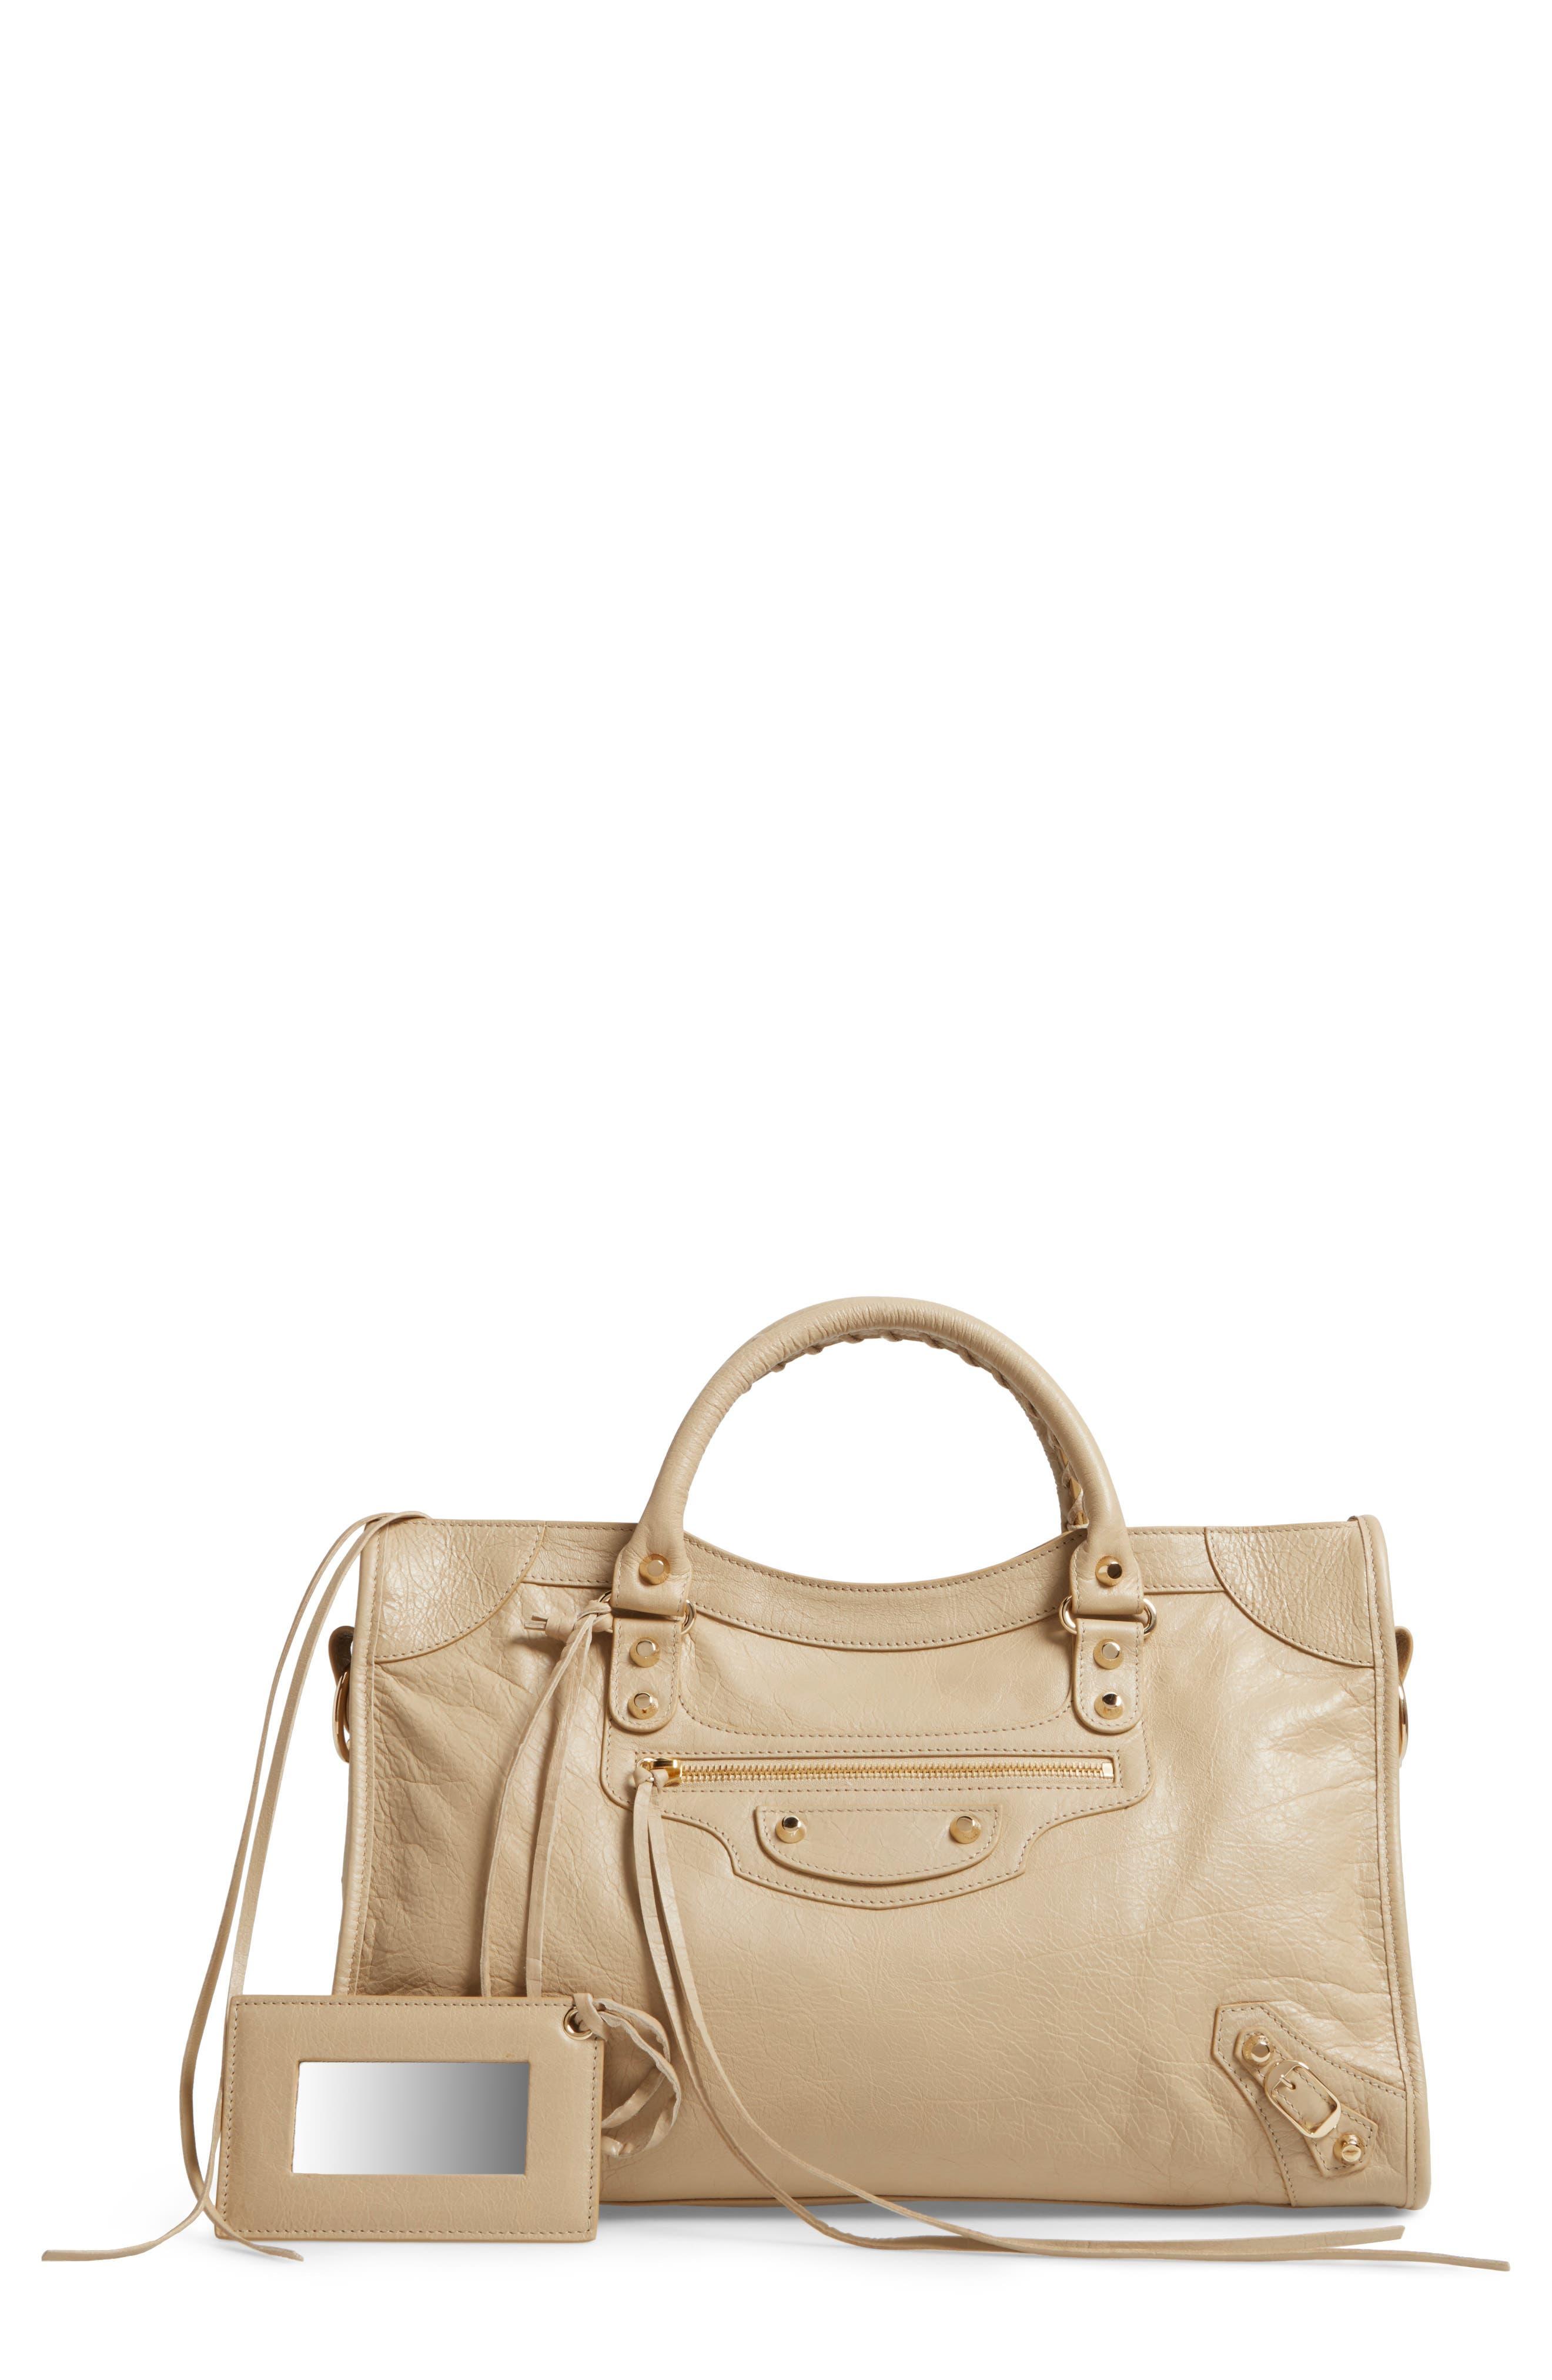 Alternate Image 1 Selected - Balenciaga Classic City Bag